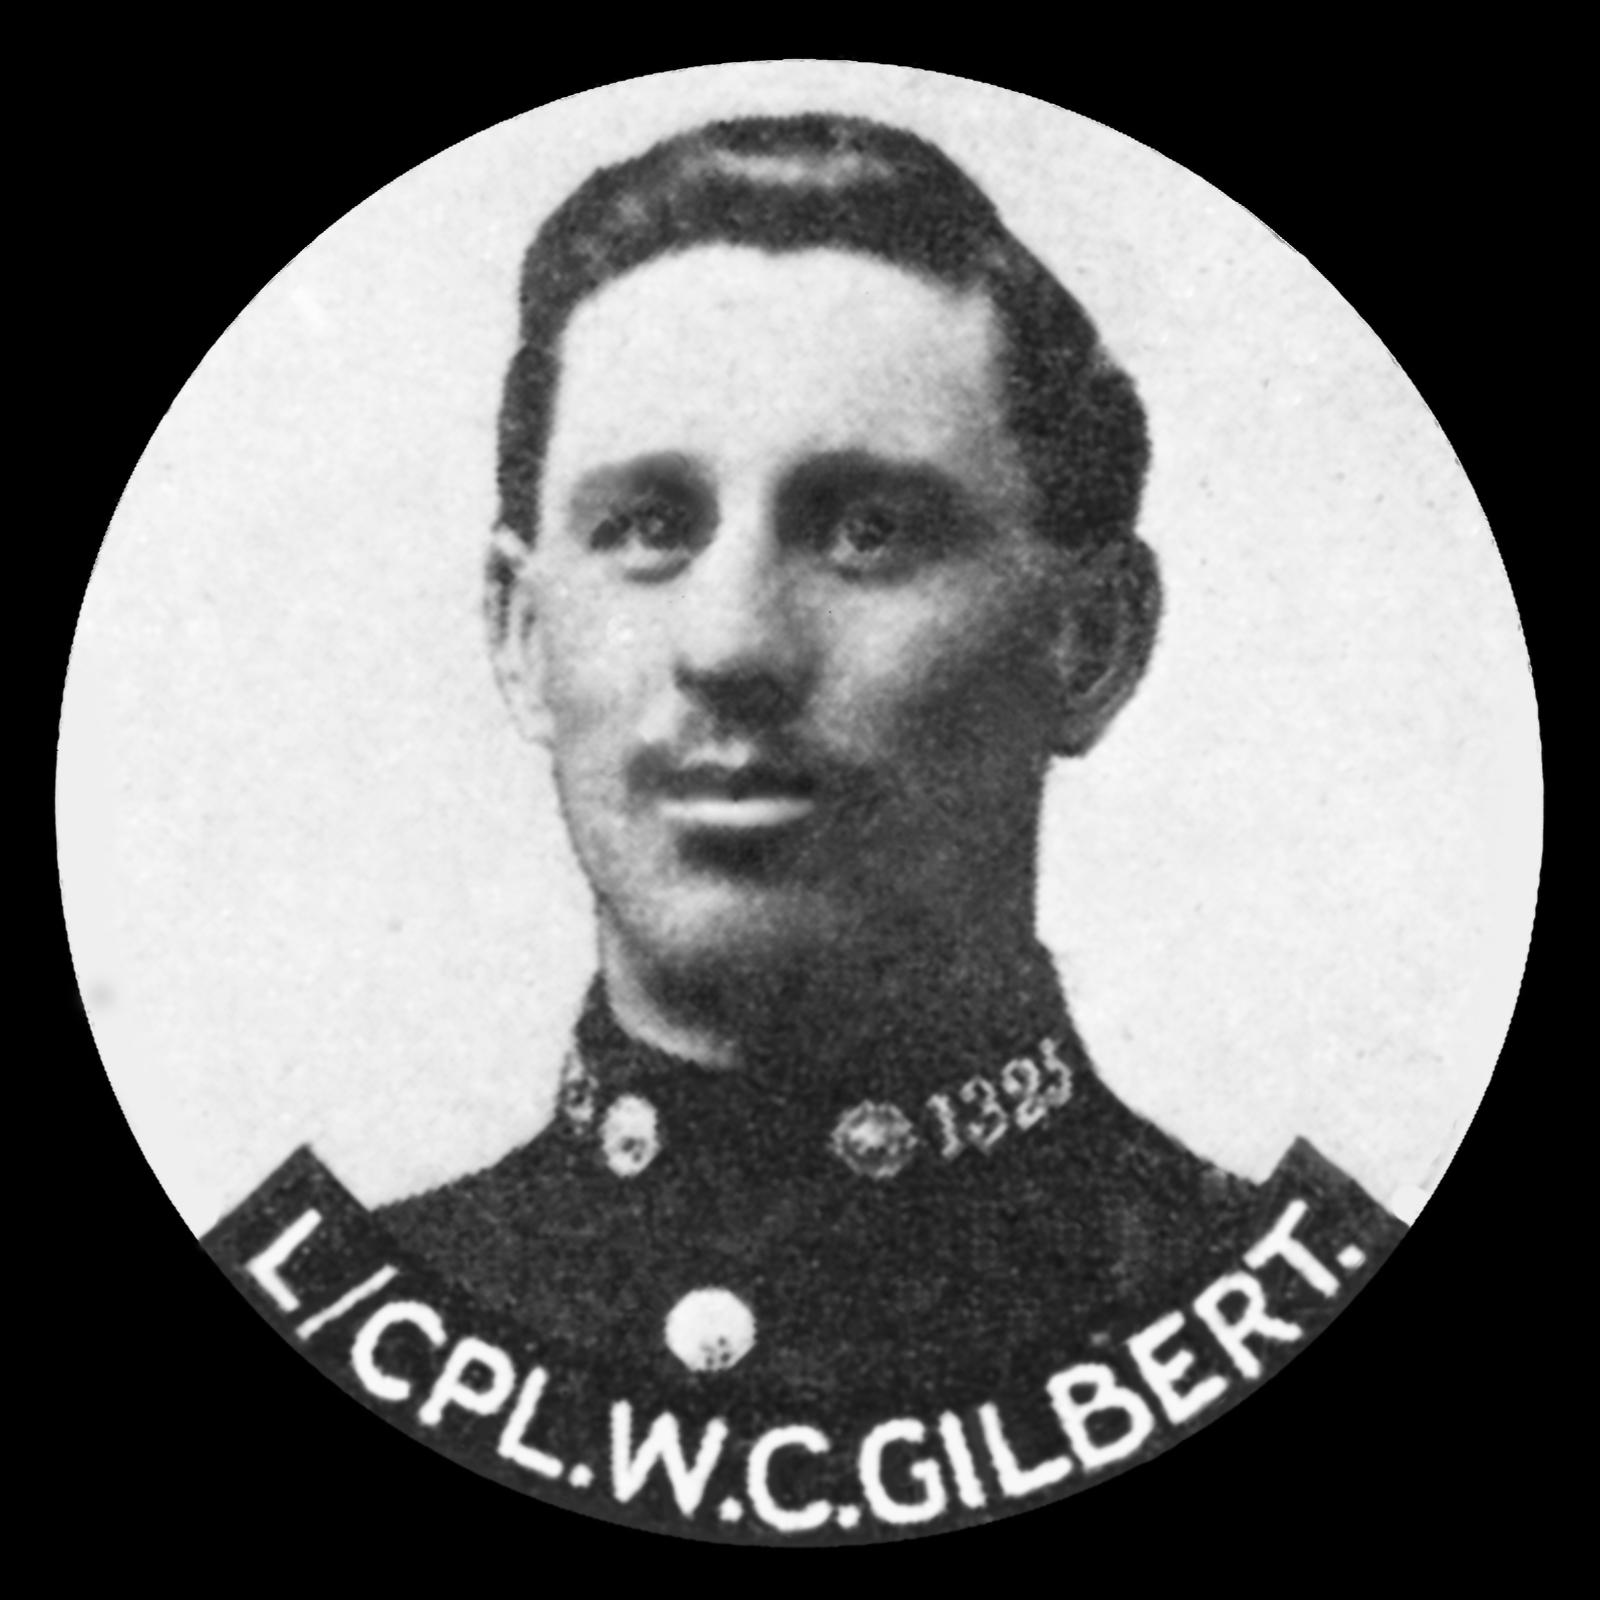 GILBERT Walter Charles